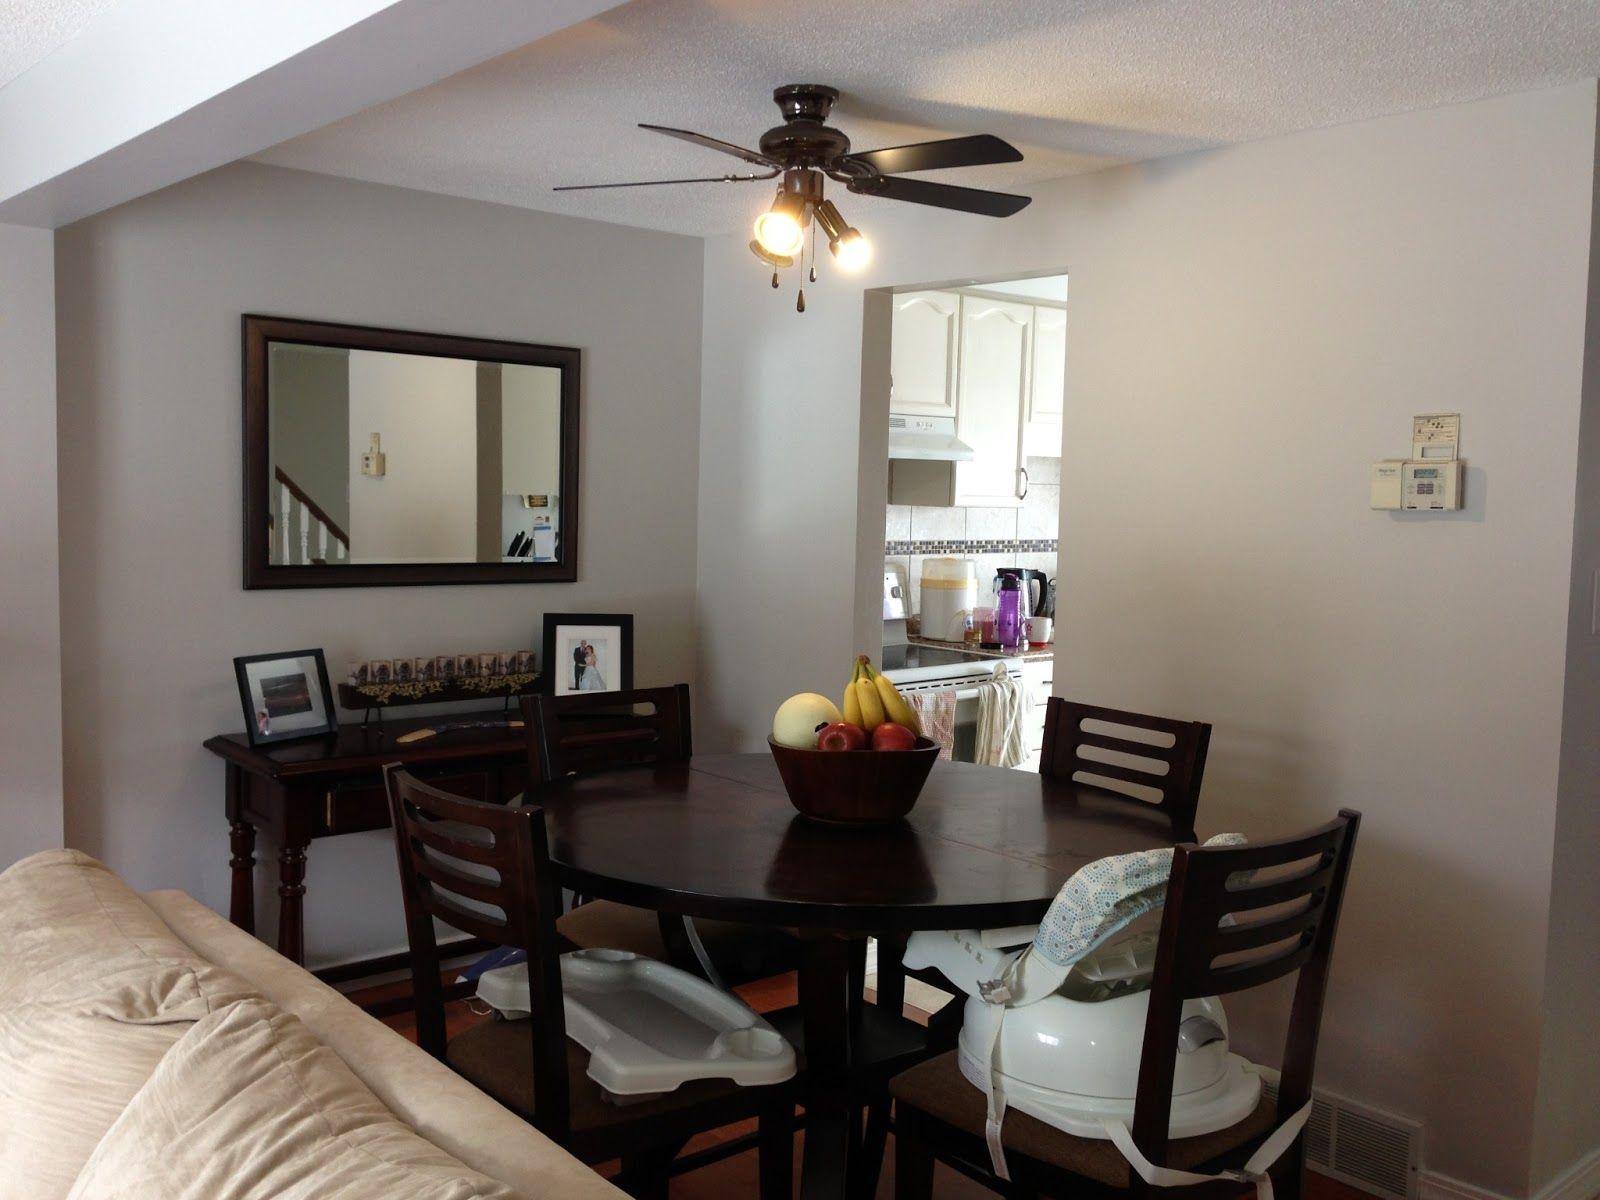 mirror dining room - Google Search | Dining Room | Pinterest ...